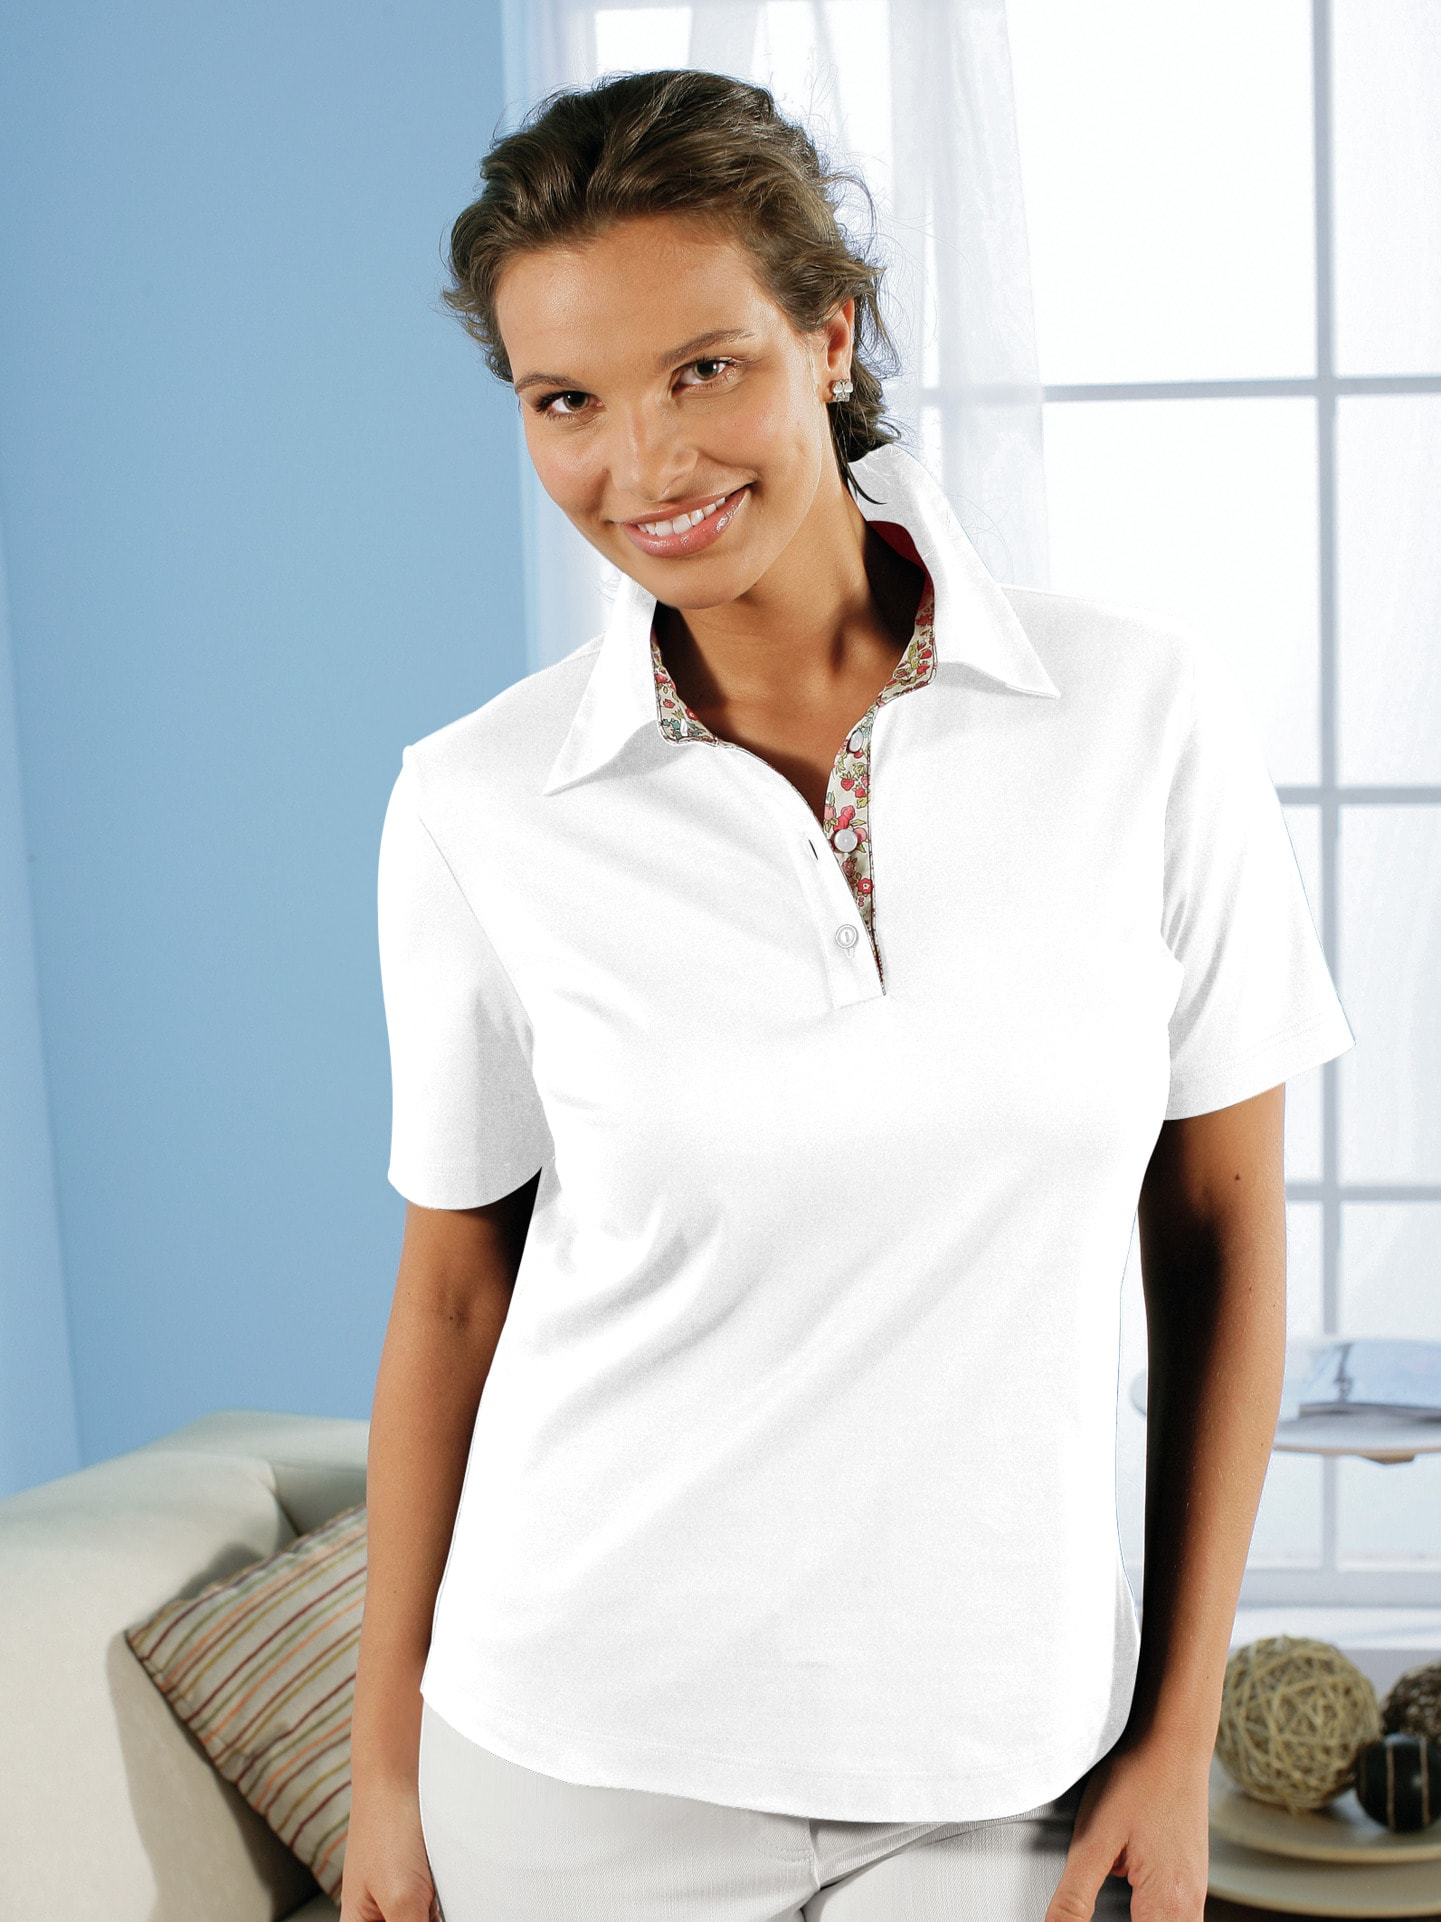 Avena Damen Poloshirt Weiß einfarbig